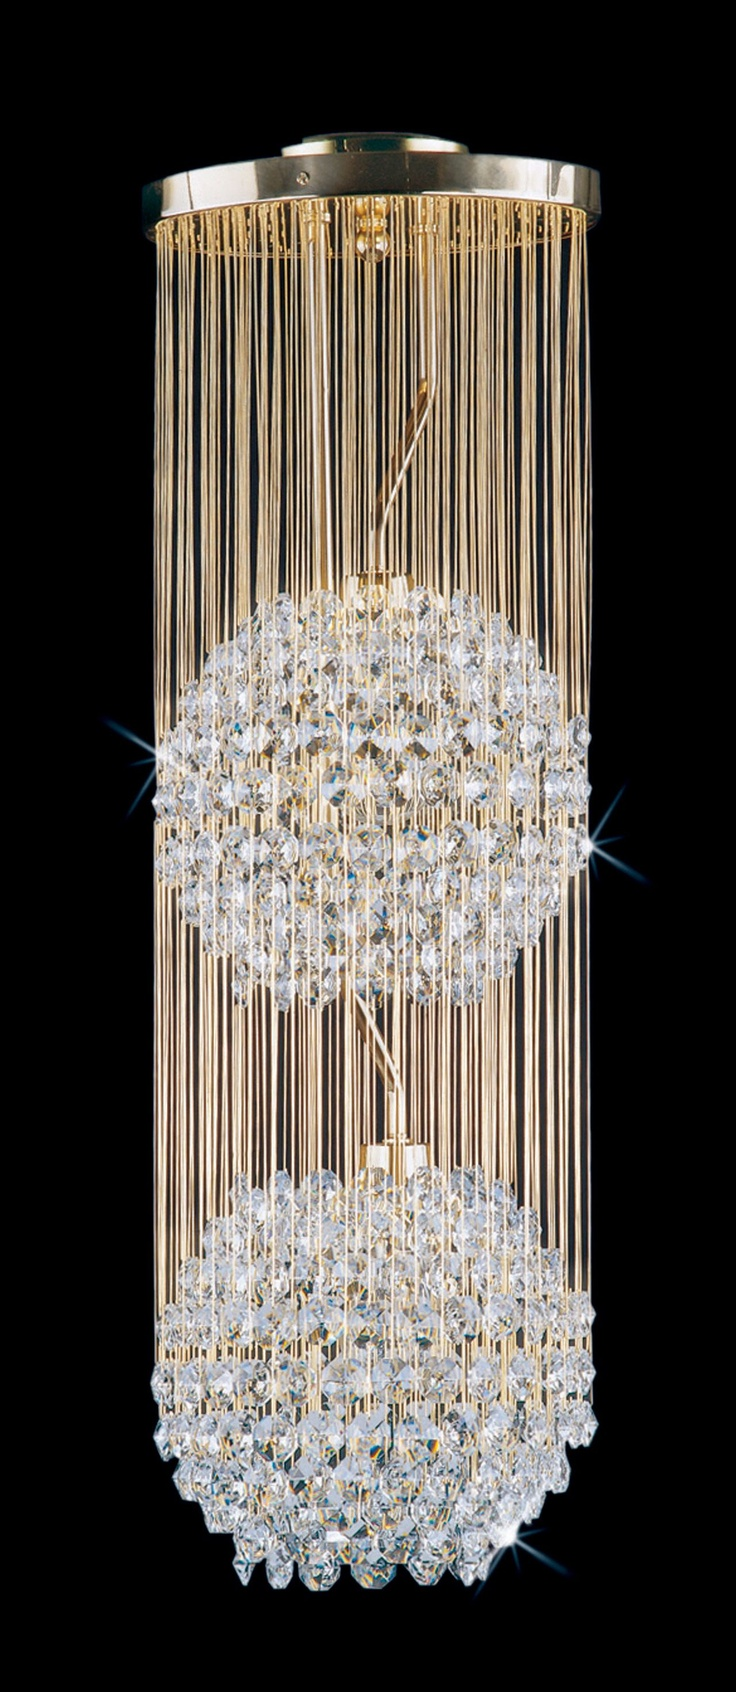 Chandelier Lighting #lighting